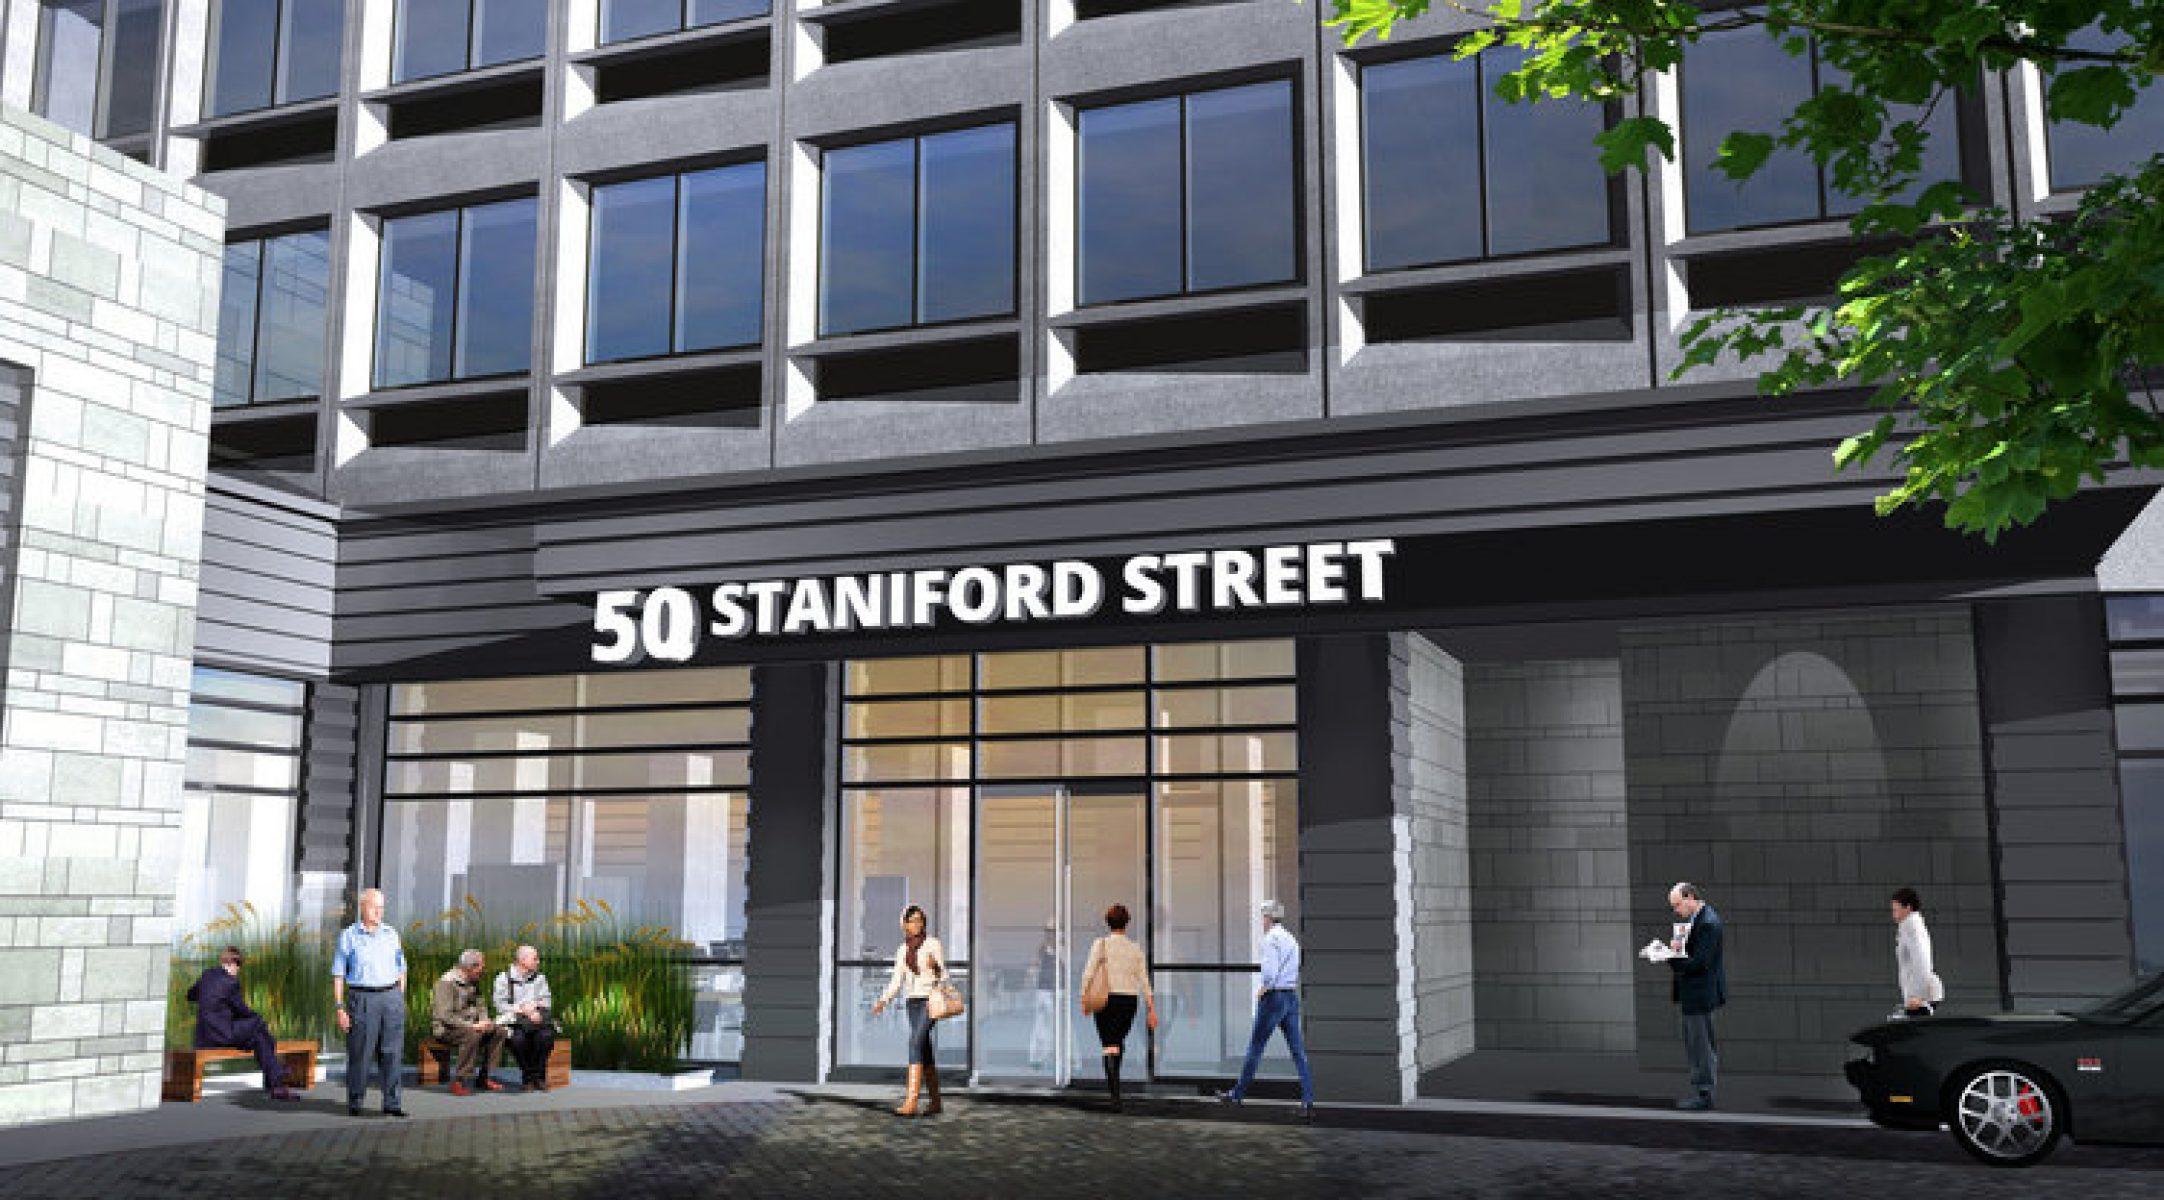 50 Staniford